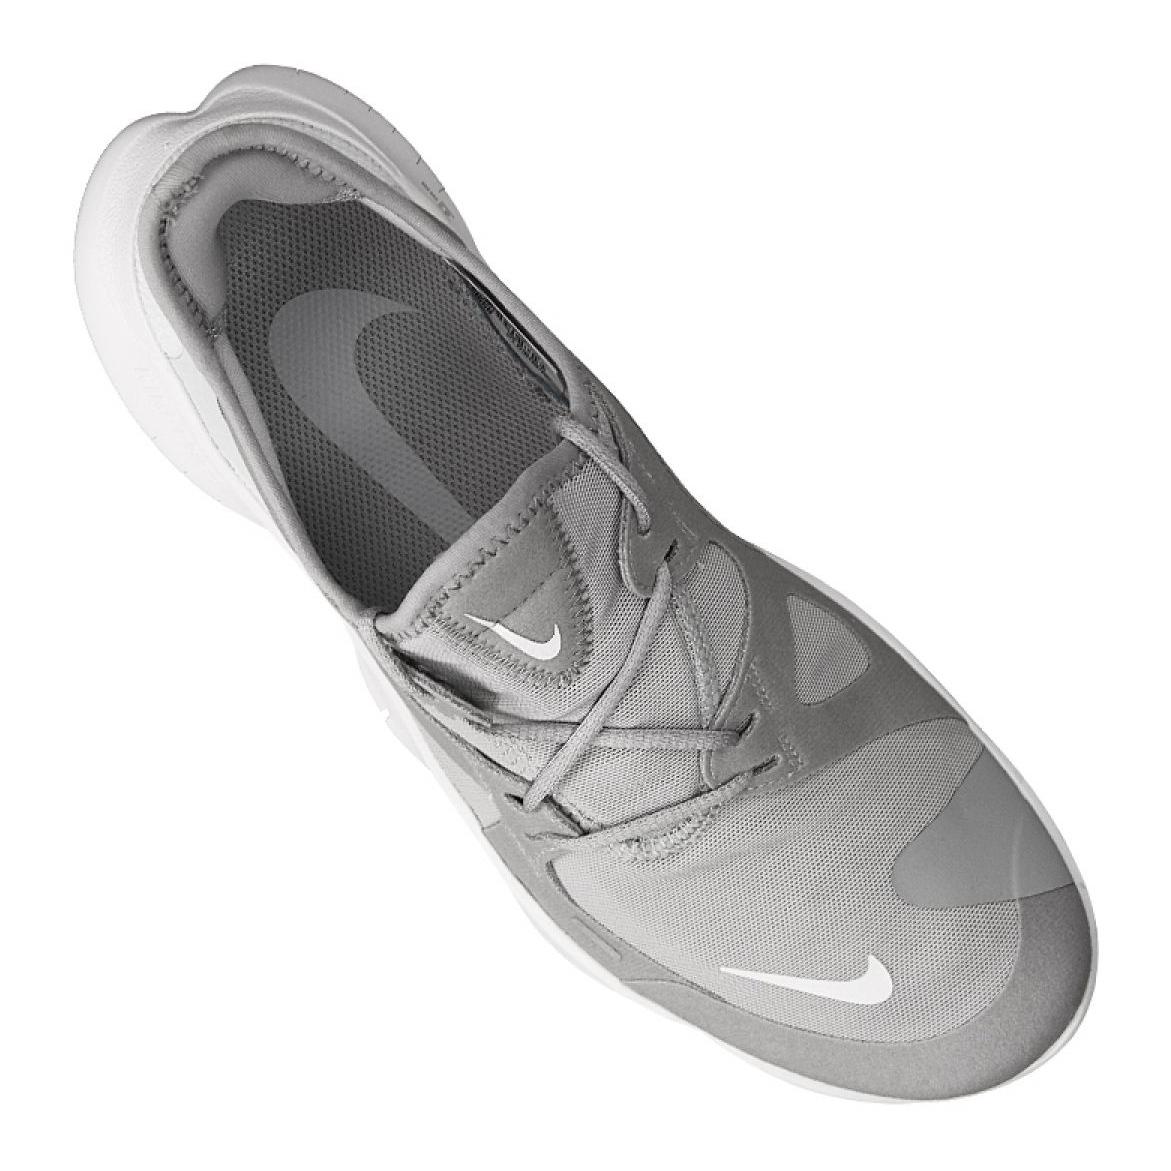 1d5f7b7cd Gris Chaussures de running Nike Free Rn 5.0 M AQ1289-001